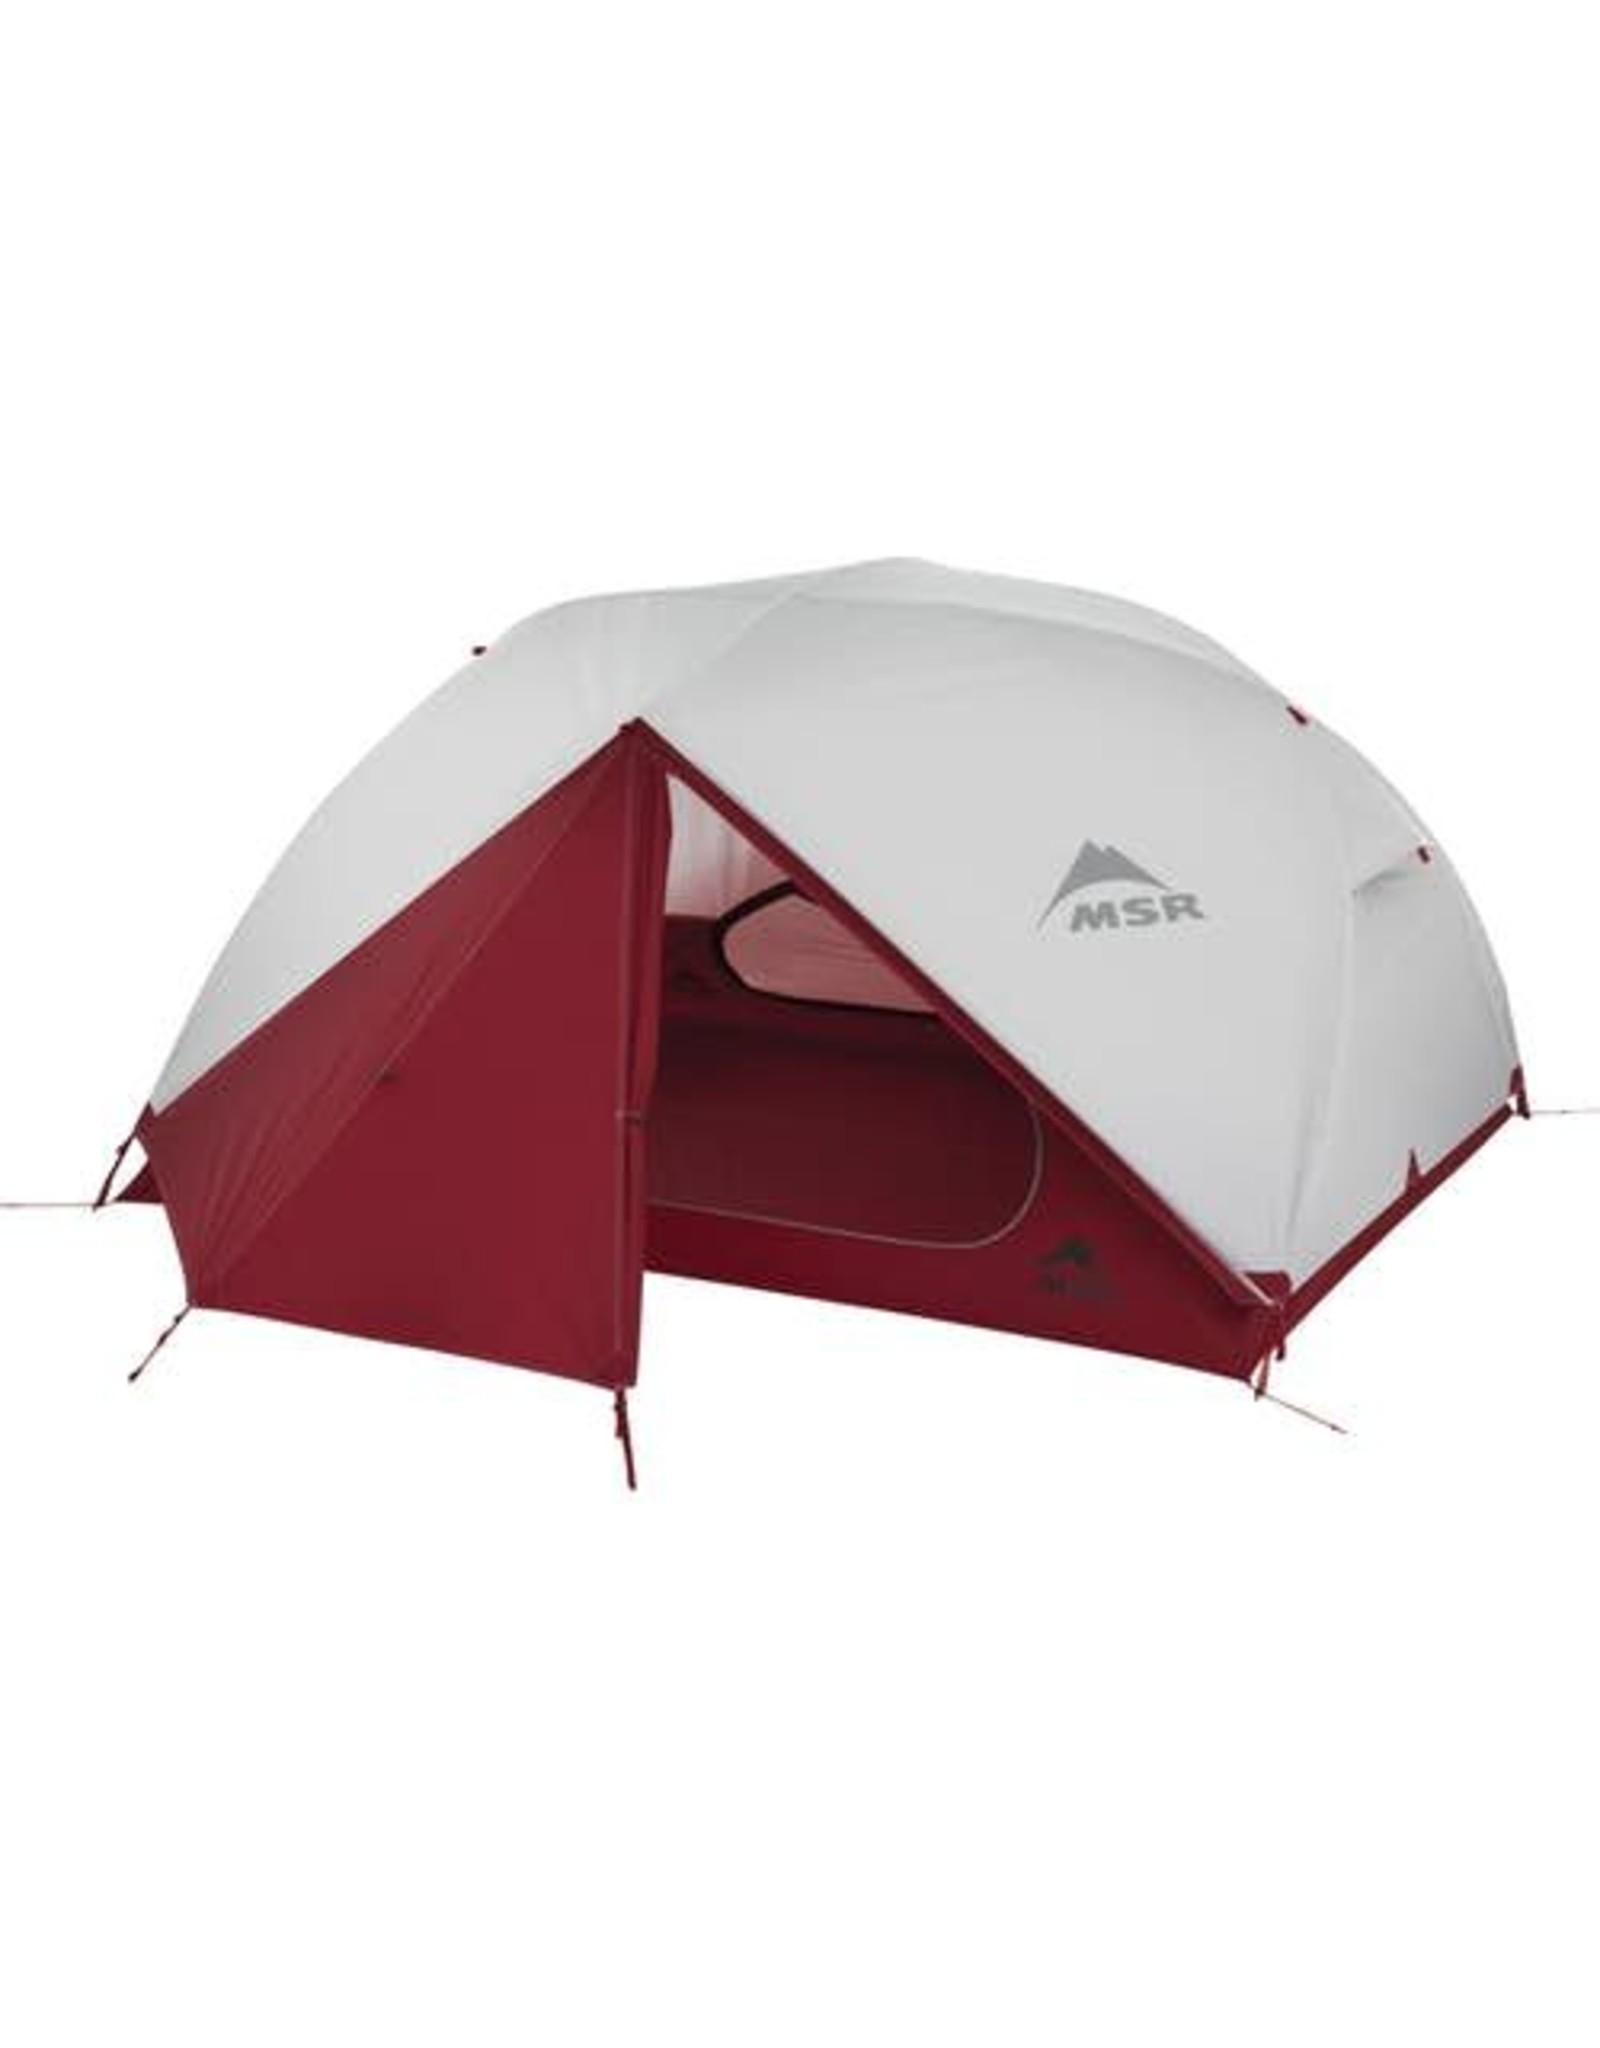 MSR MSR Elixir 3 Tent S17